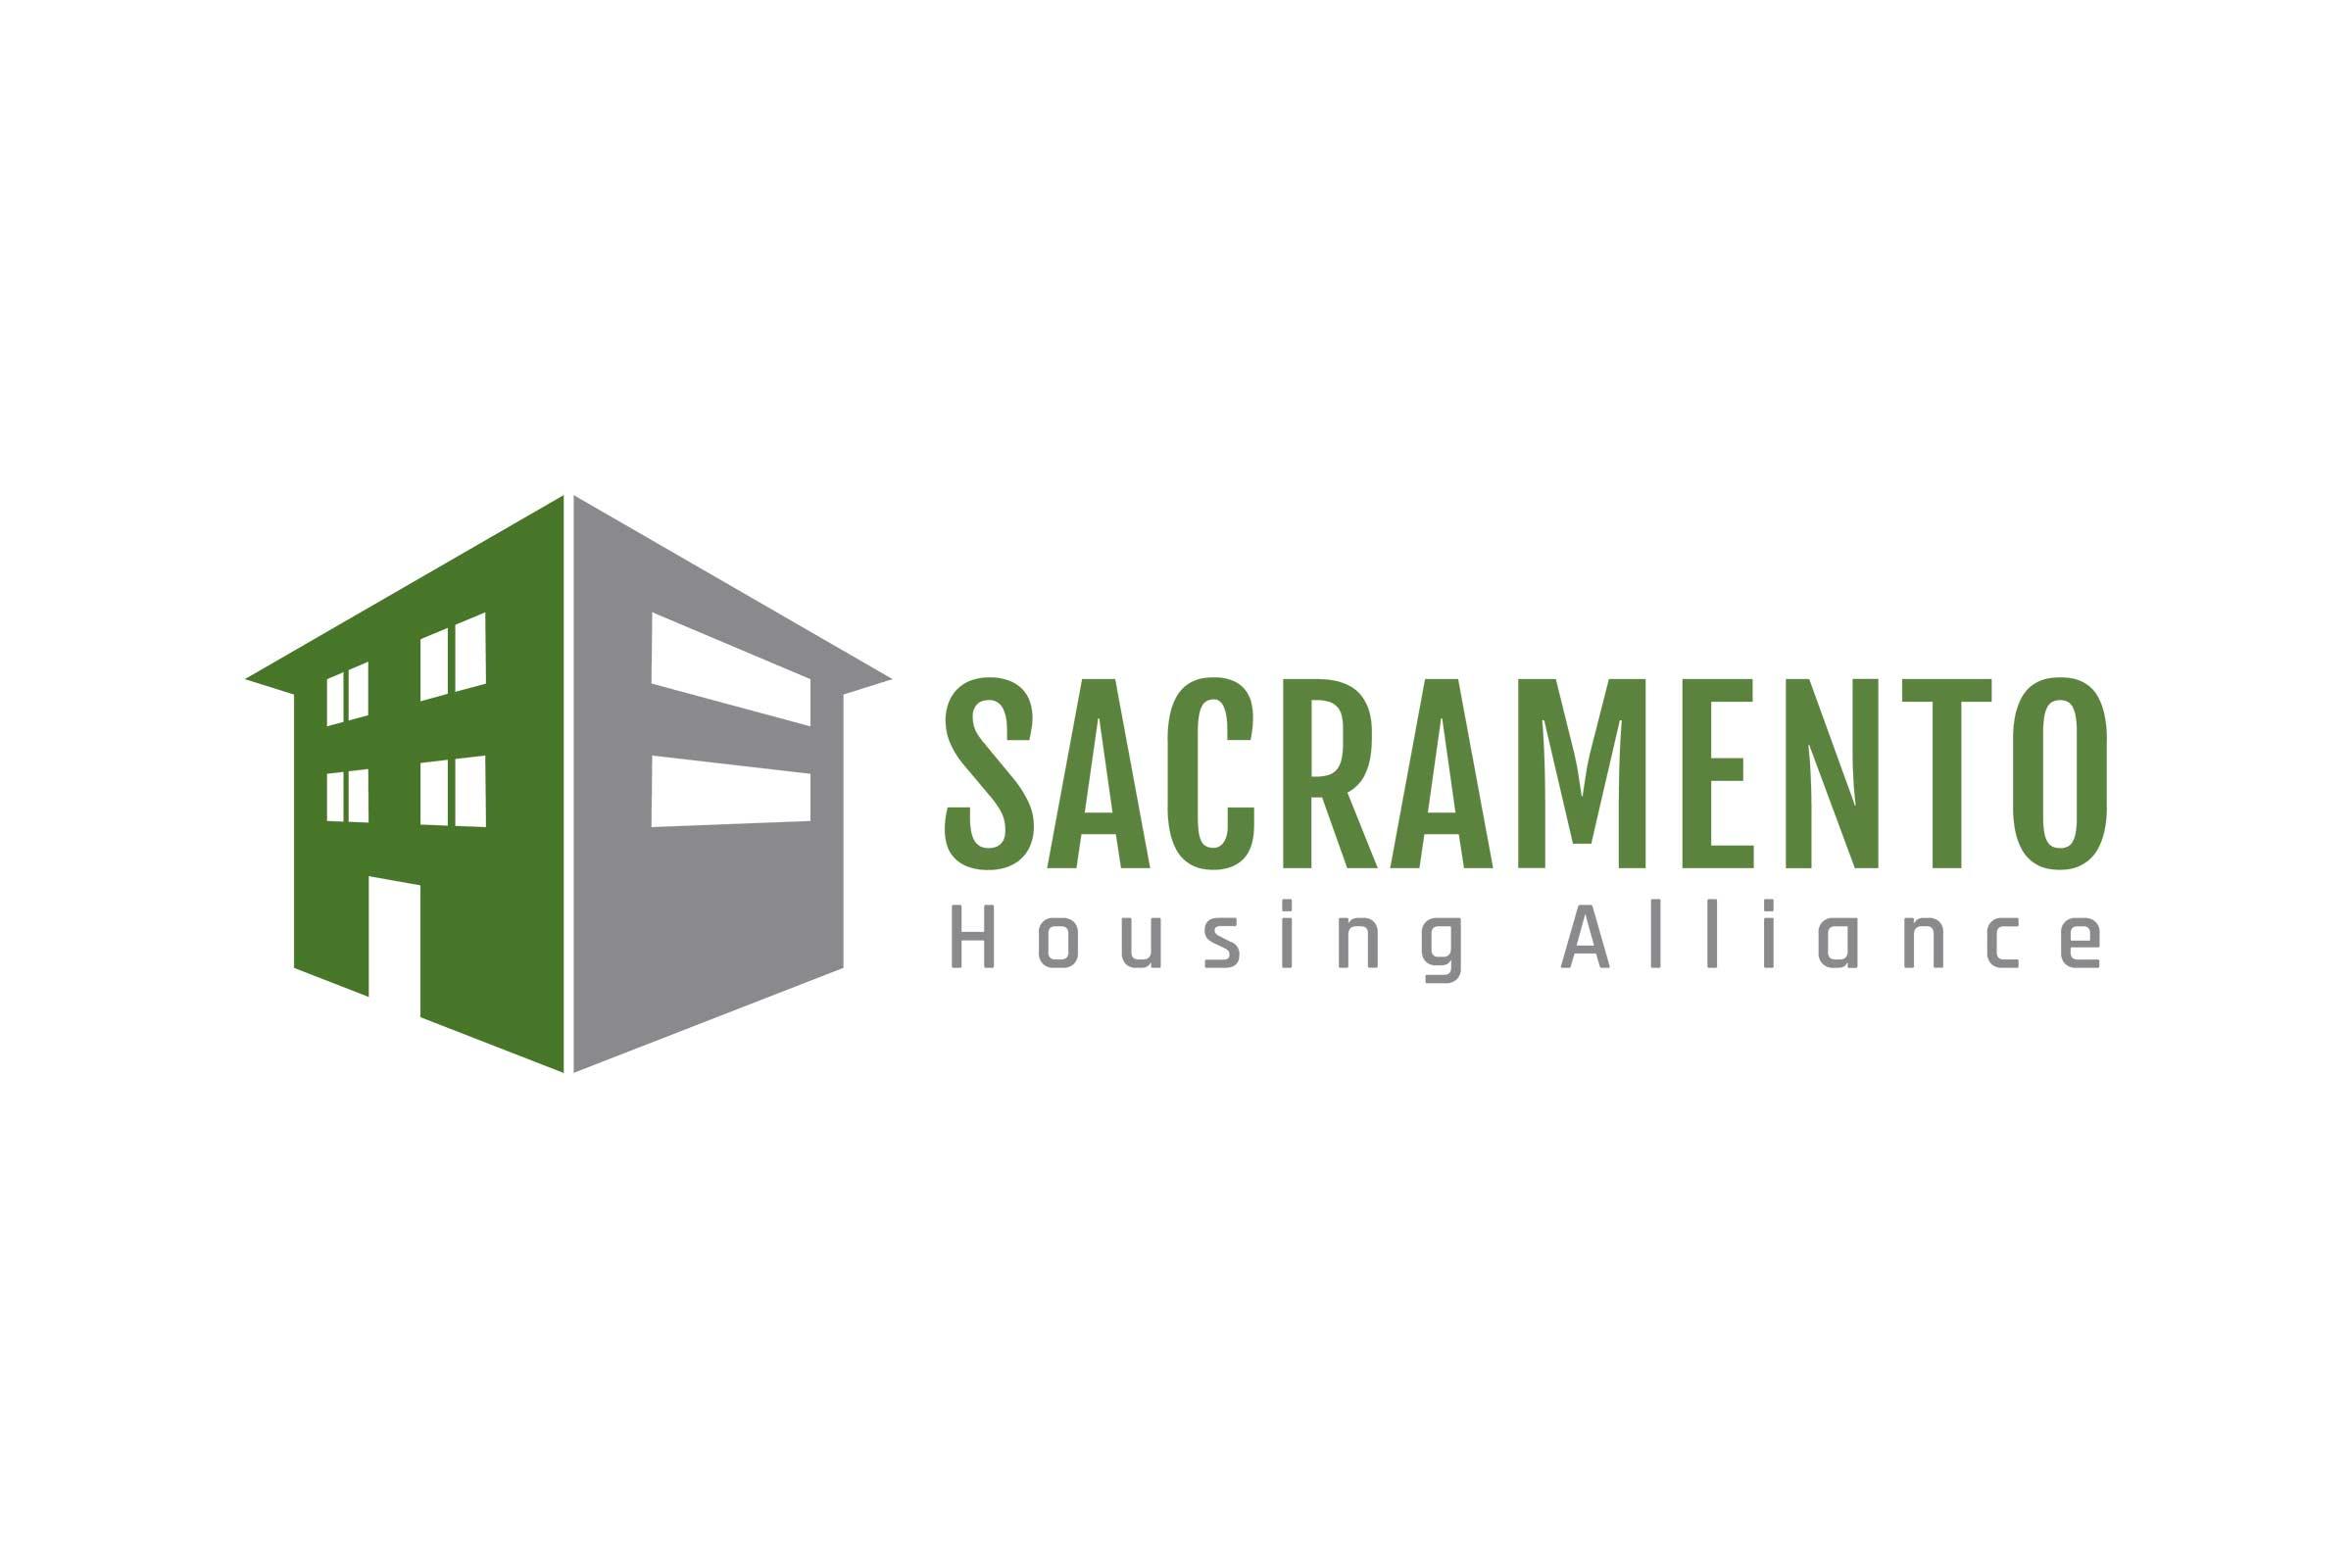 Sacramento Housing Alliance